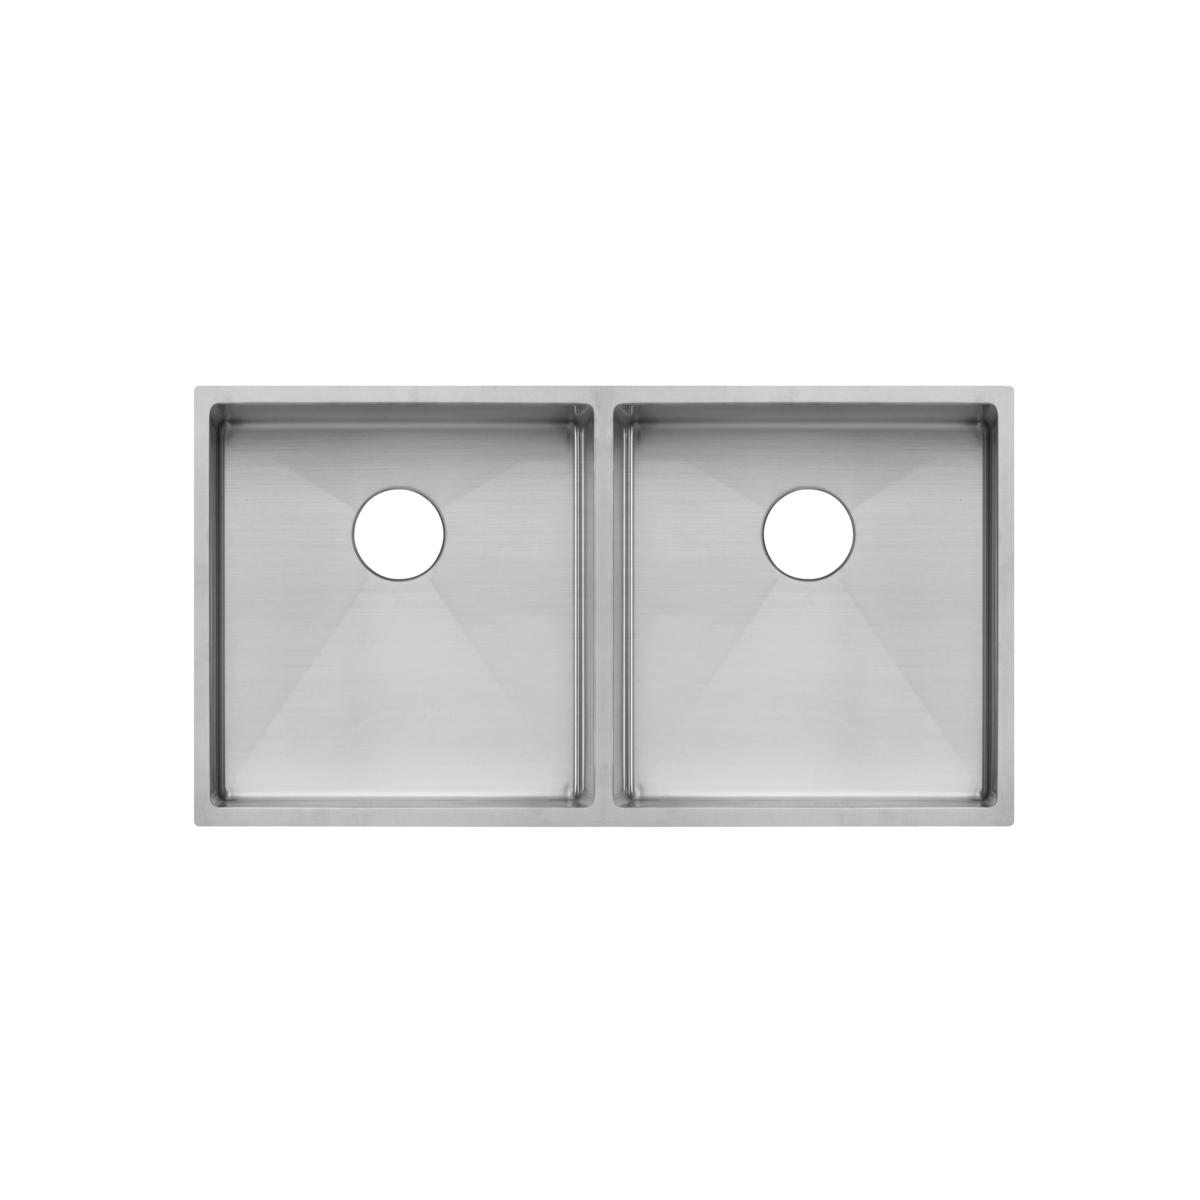 Zalo – Kitchen Sink Double 855mm – Stainless Steel (Racks/Overflow)